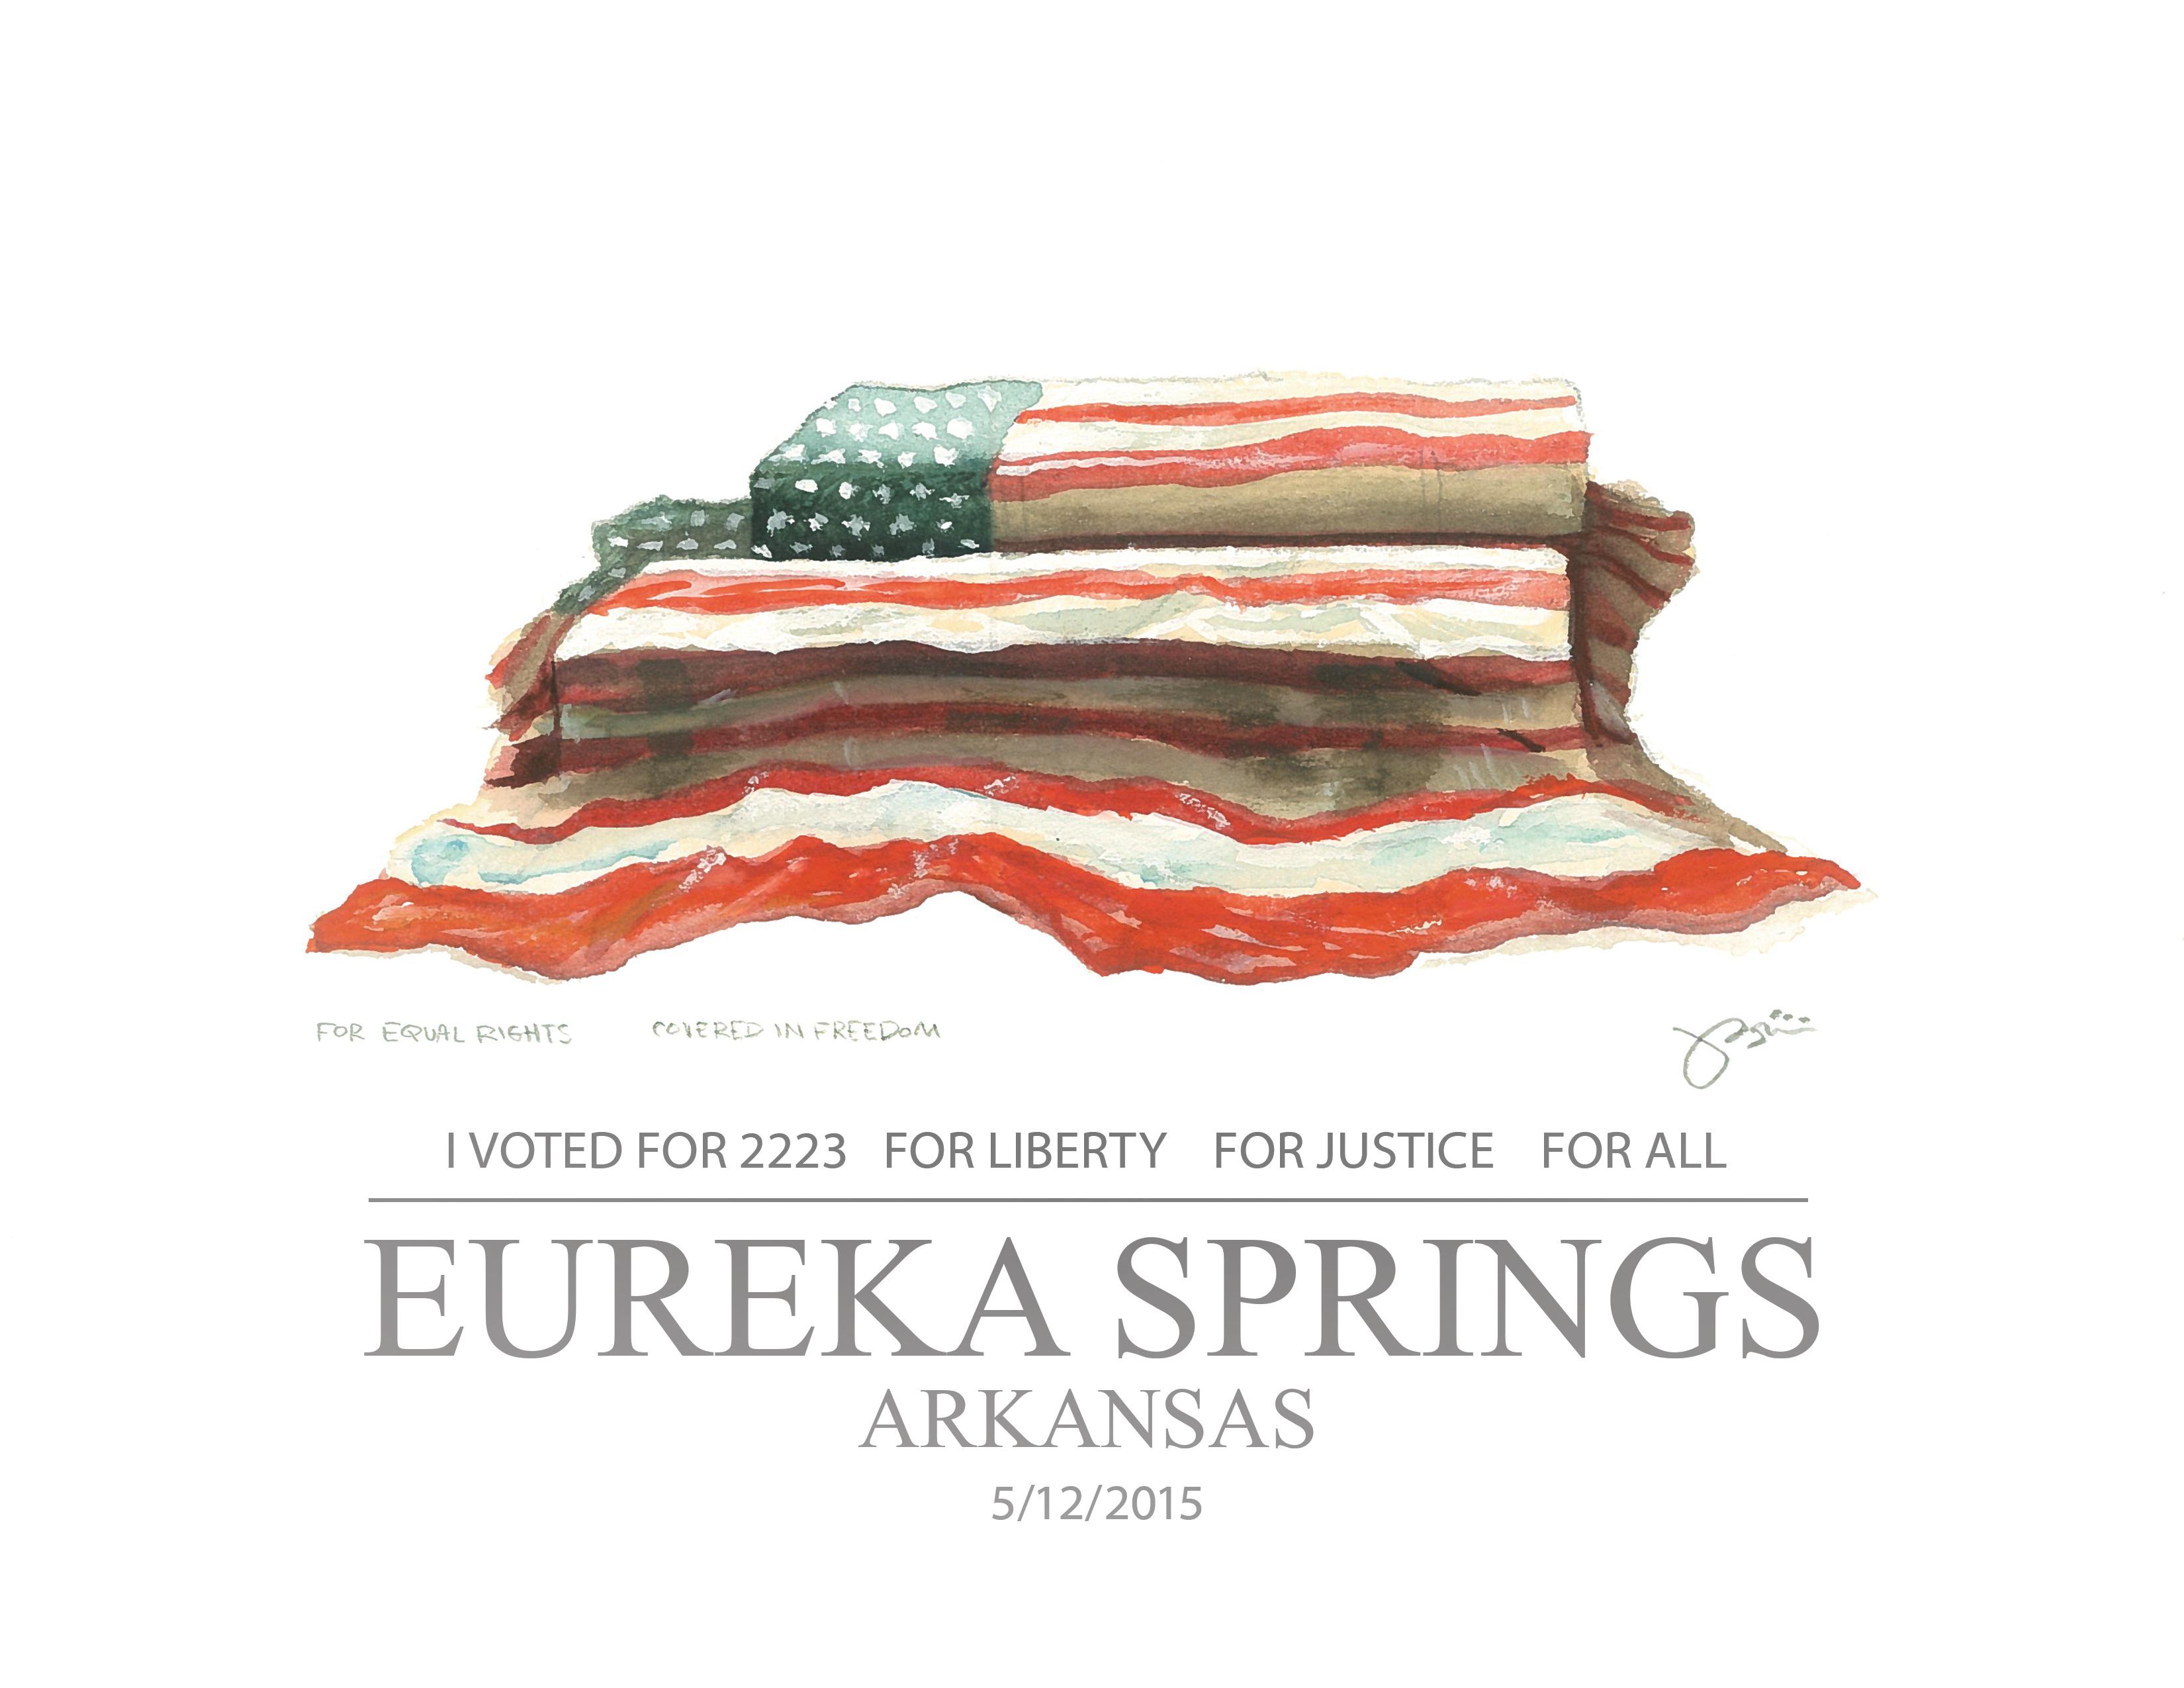 Vote2223 - Souvenir